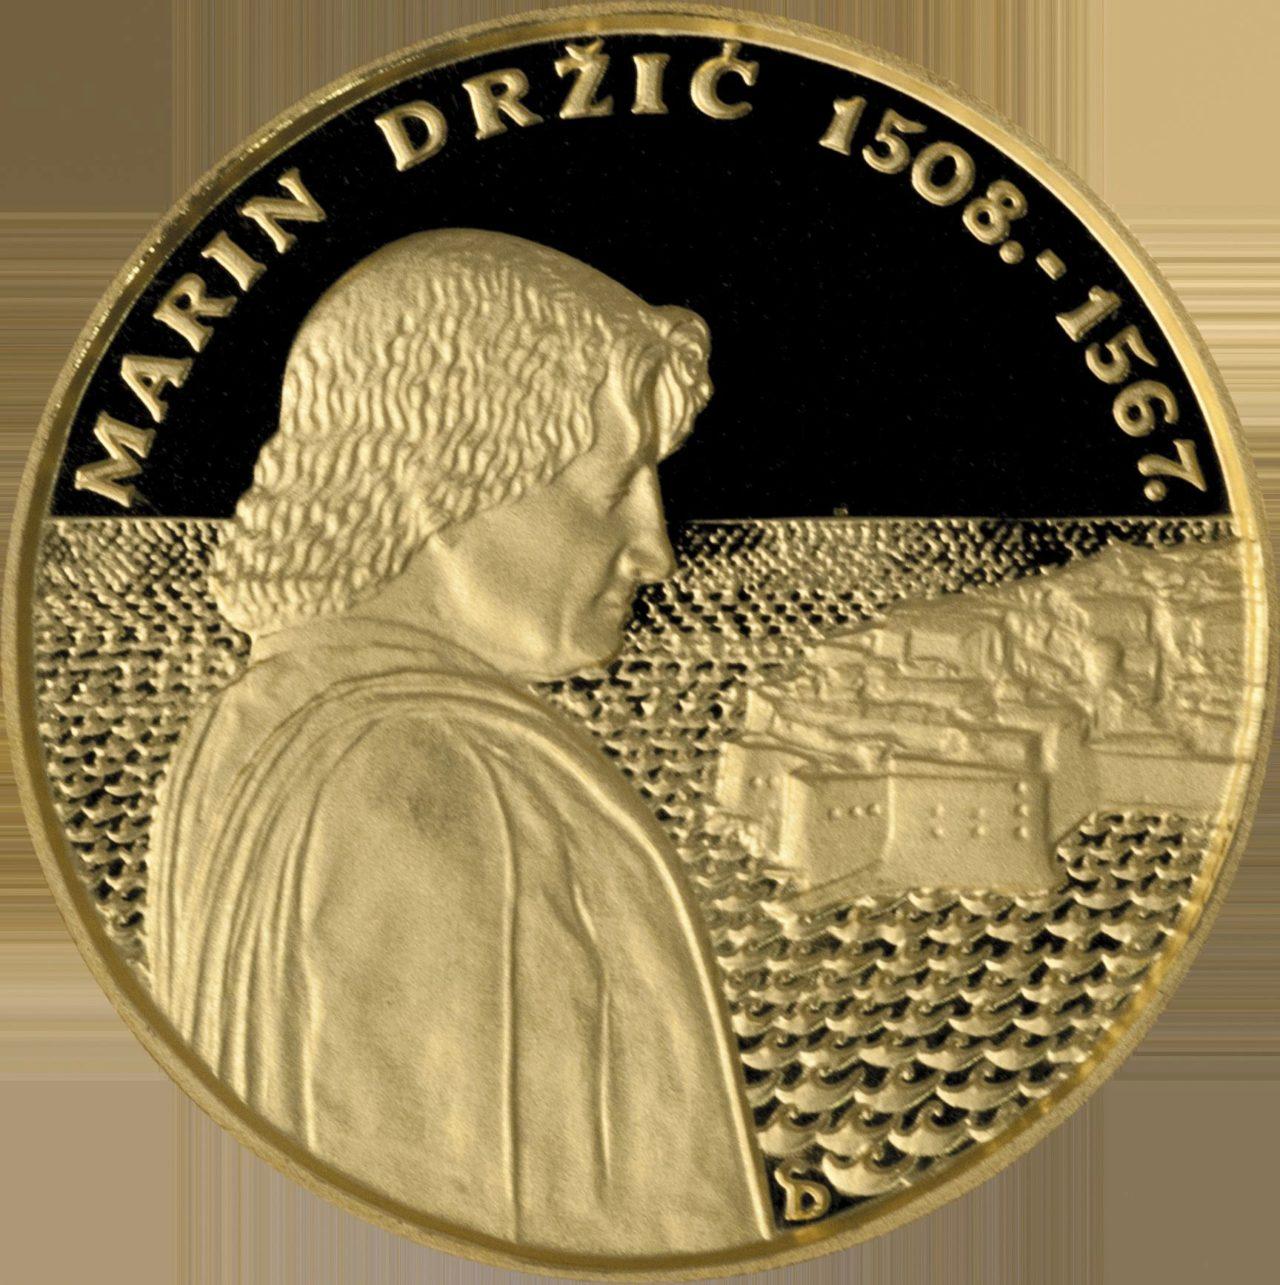 Marin Drzic